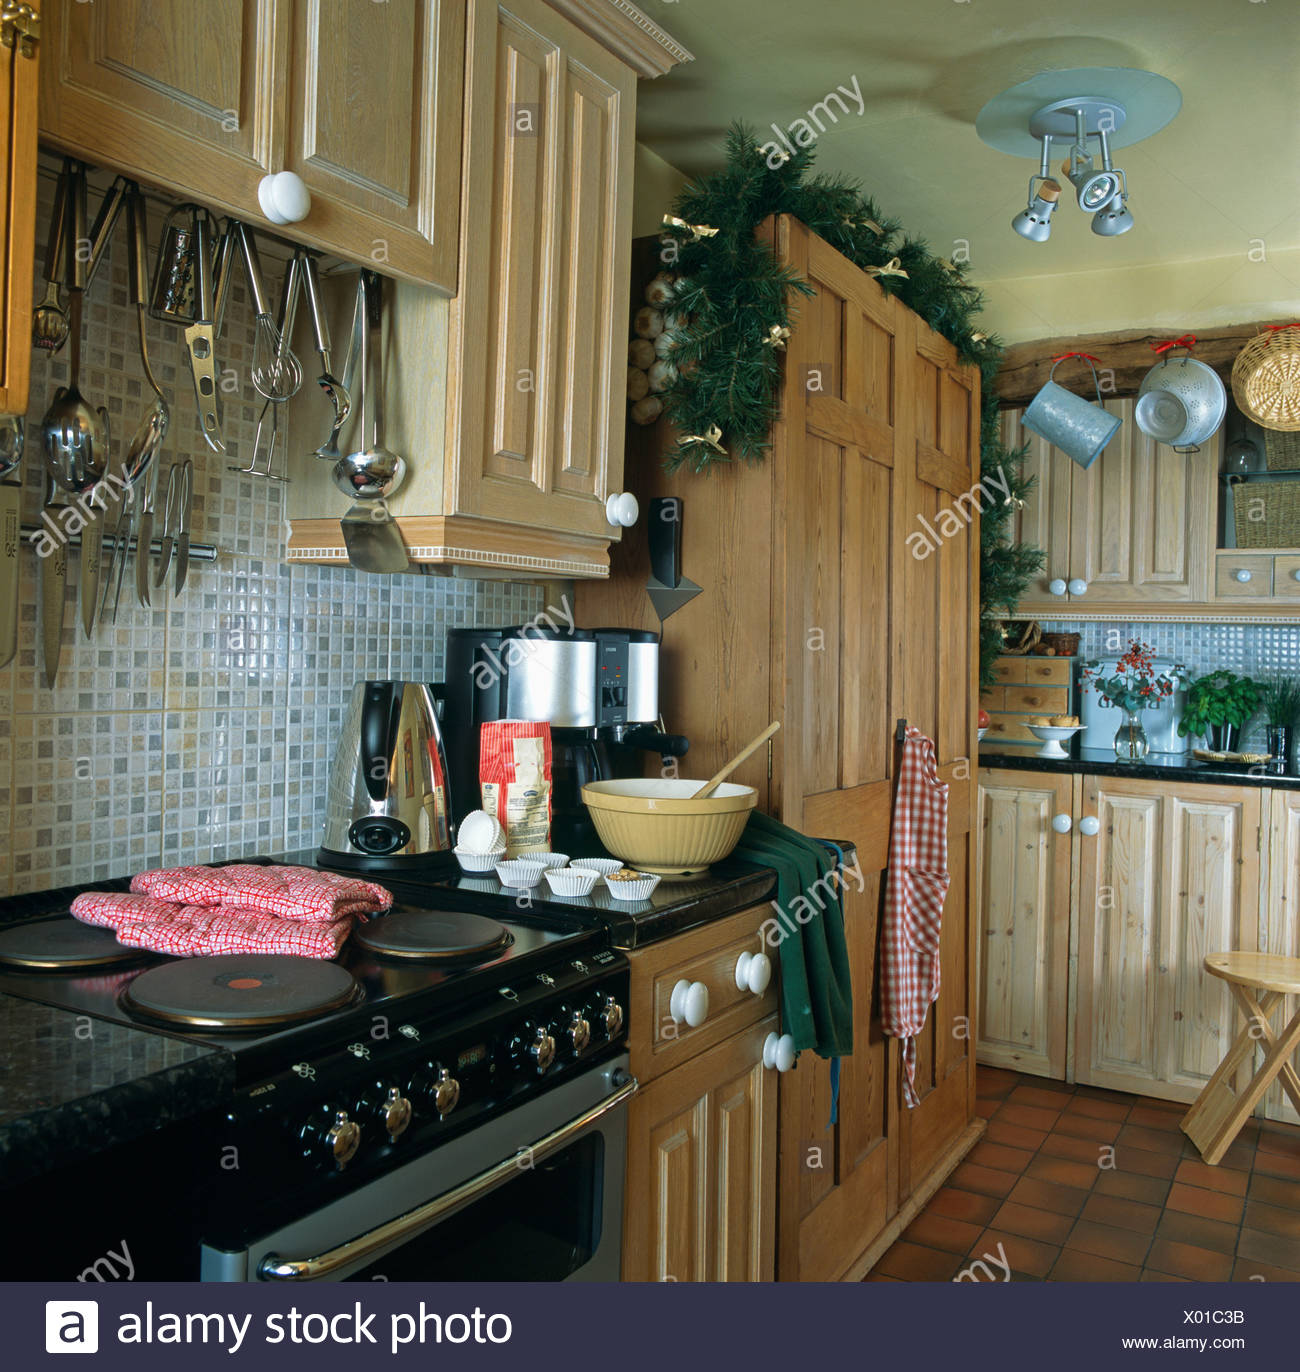 Interiors Kitchen Storage Appliances Stockfotos & Interiors Kitchen ...